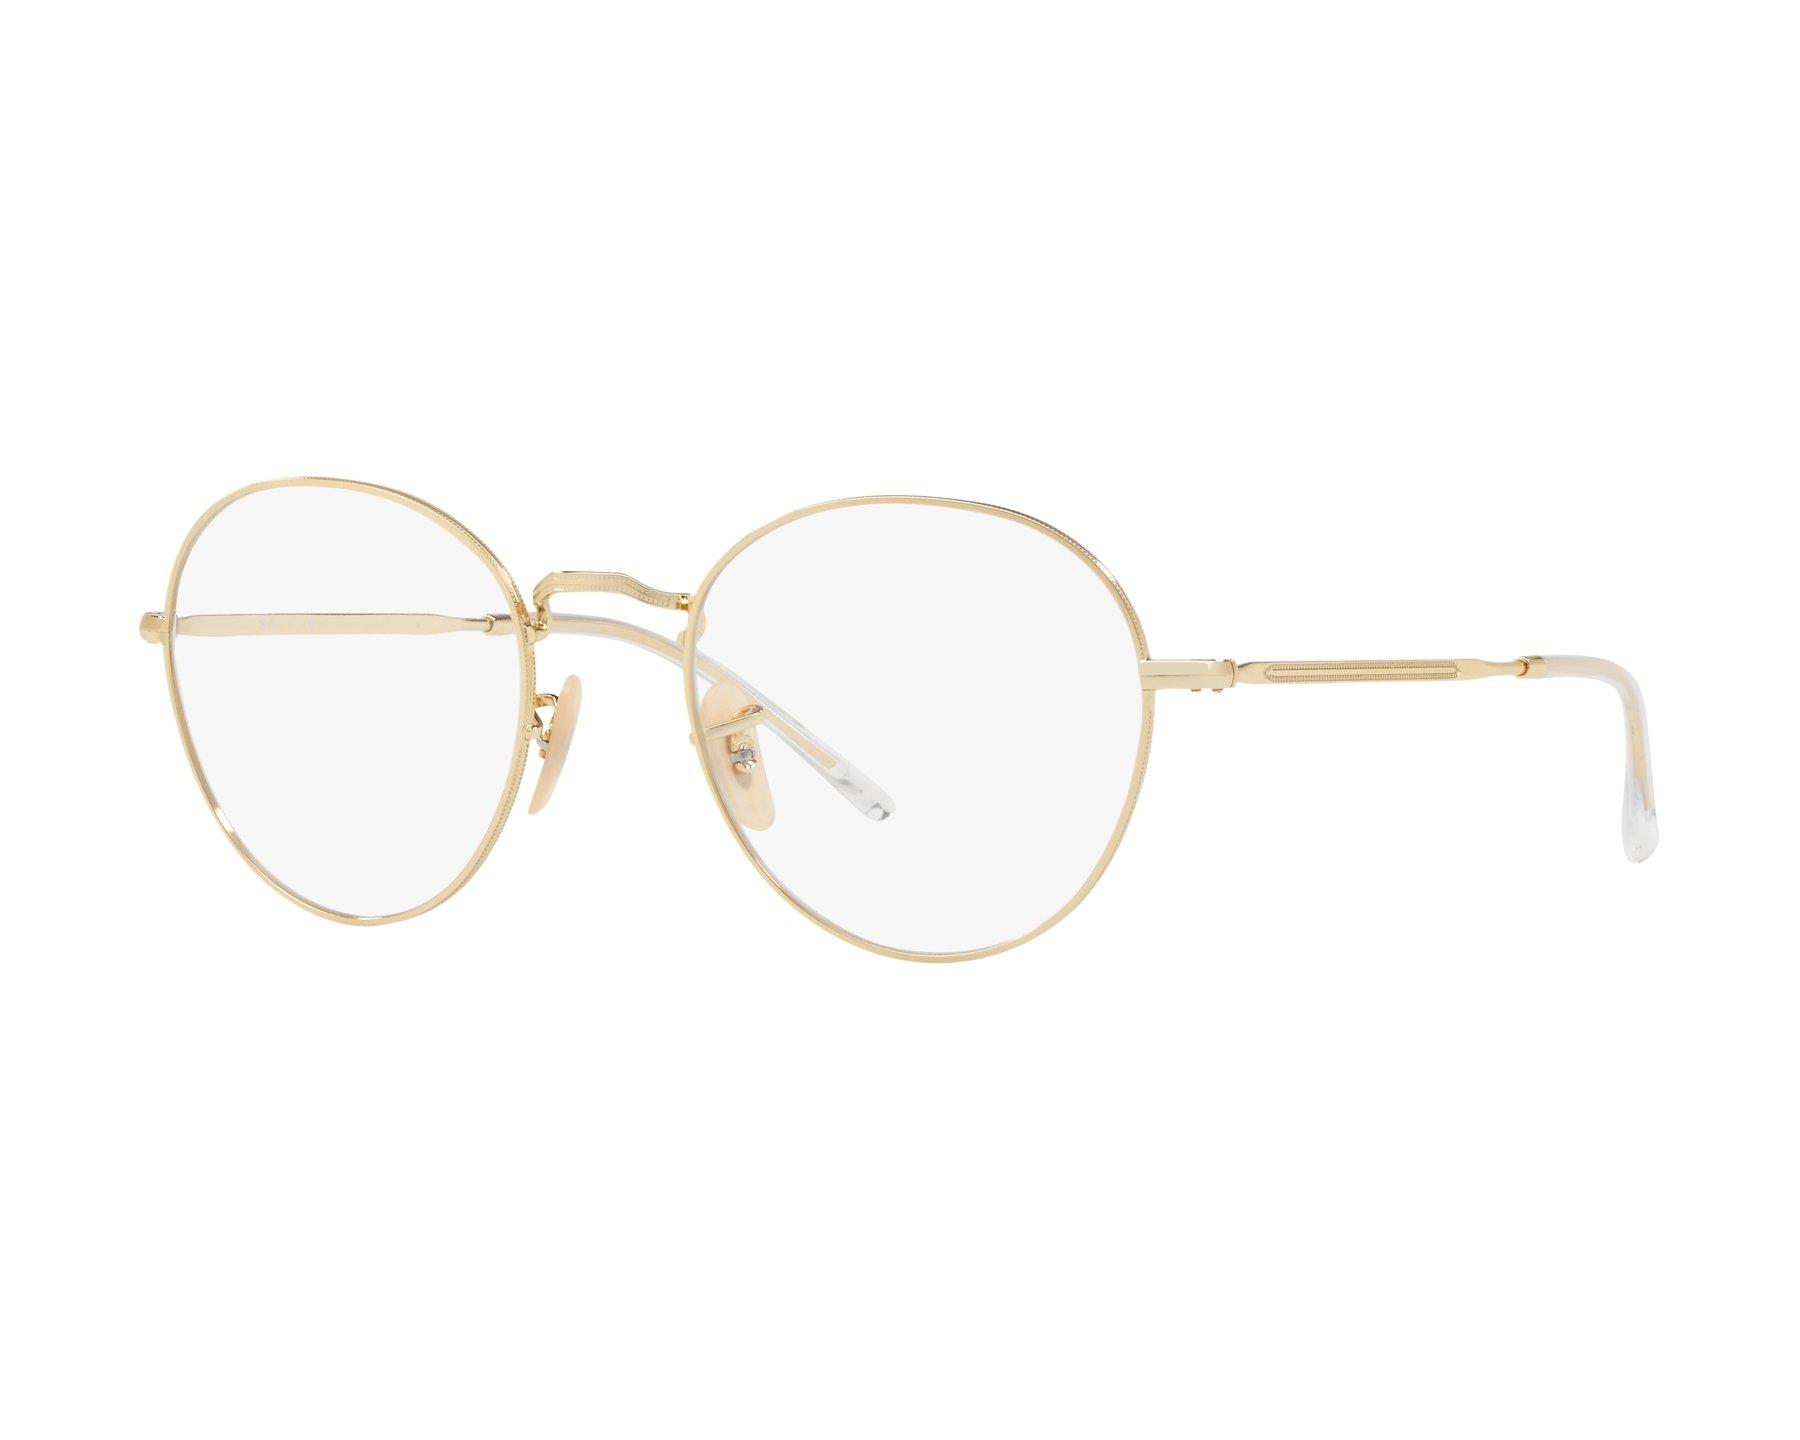 683f678a8d eyeglasses Ray-Ban RX-3582-V 2500 49-20 Gold